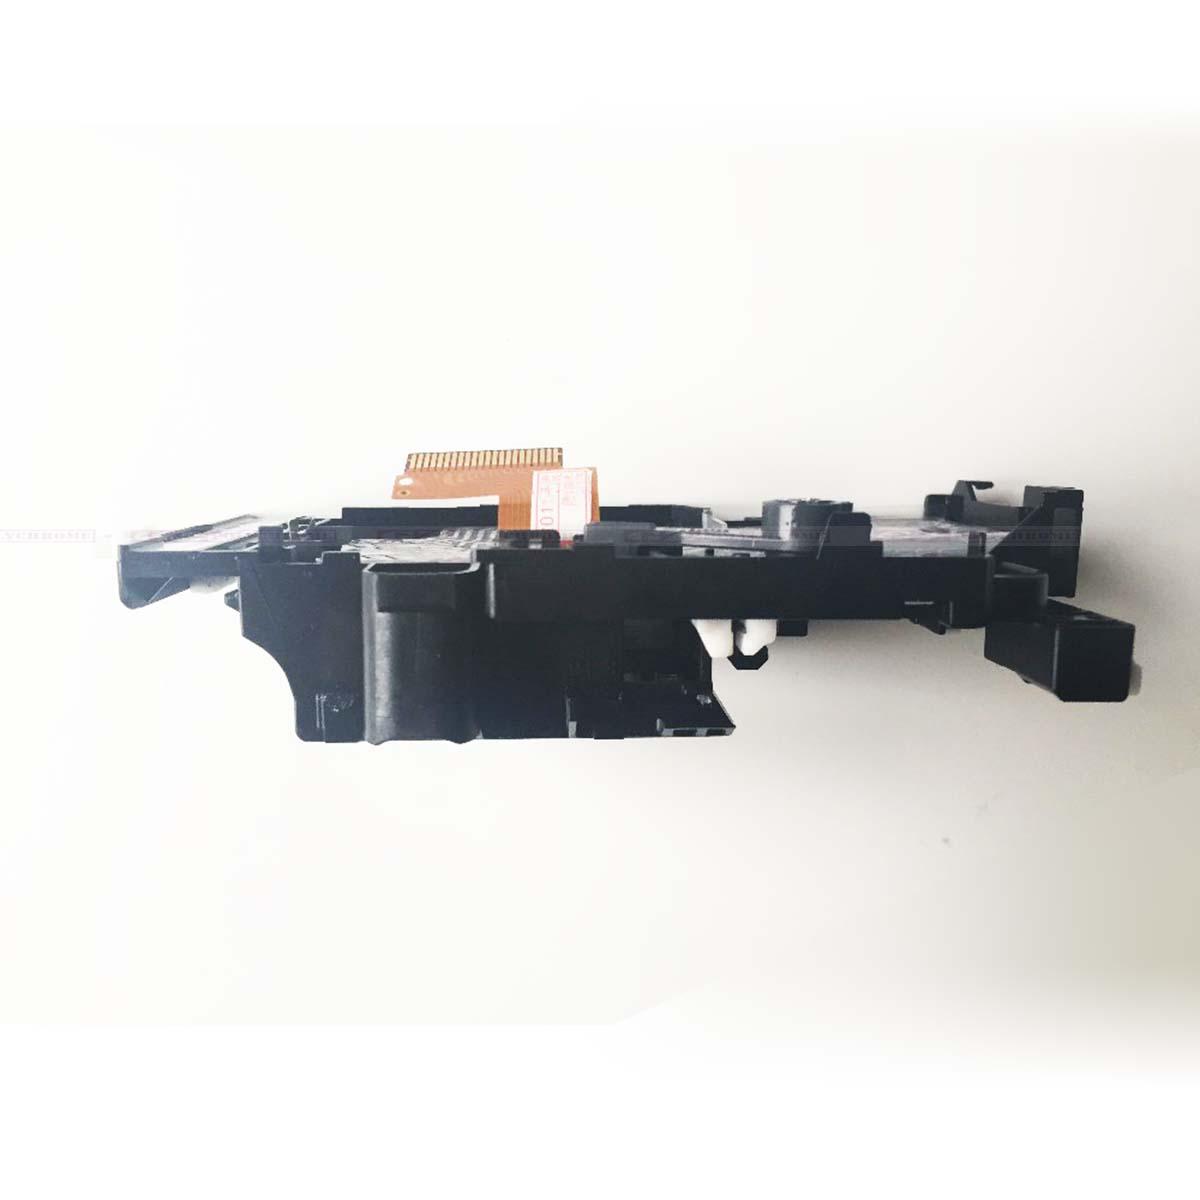 New Print Head For Brother MFC J4410 J4510 J4610 J4710 J3520 J3720 J2310 J2510 J